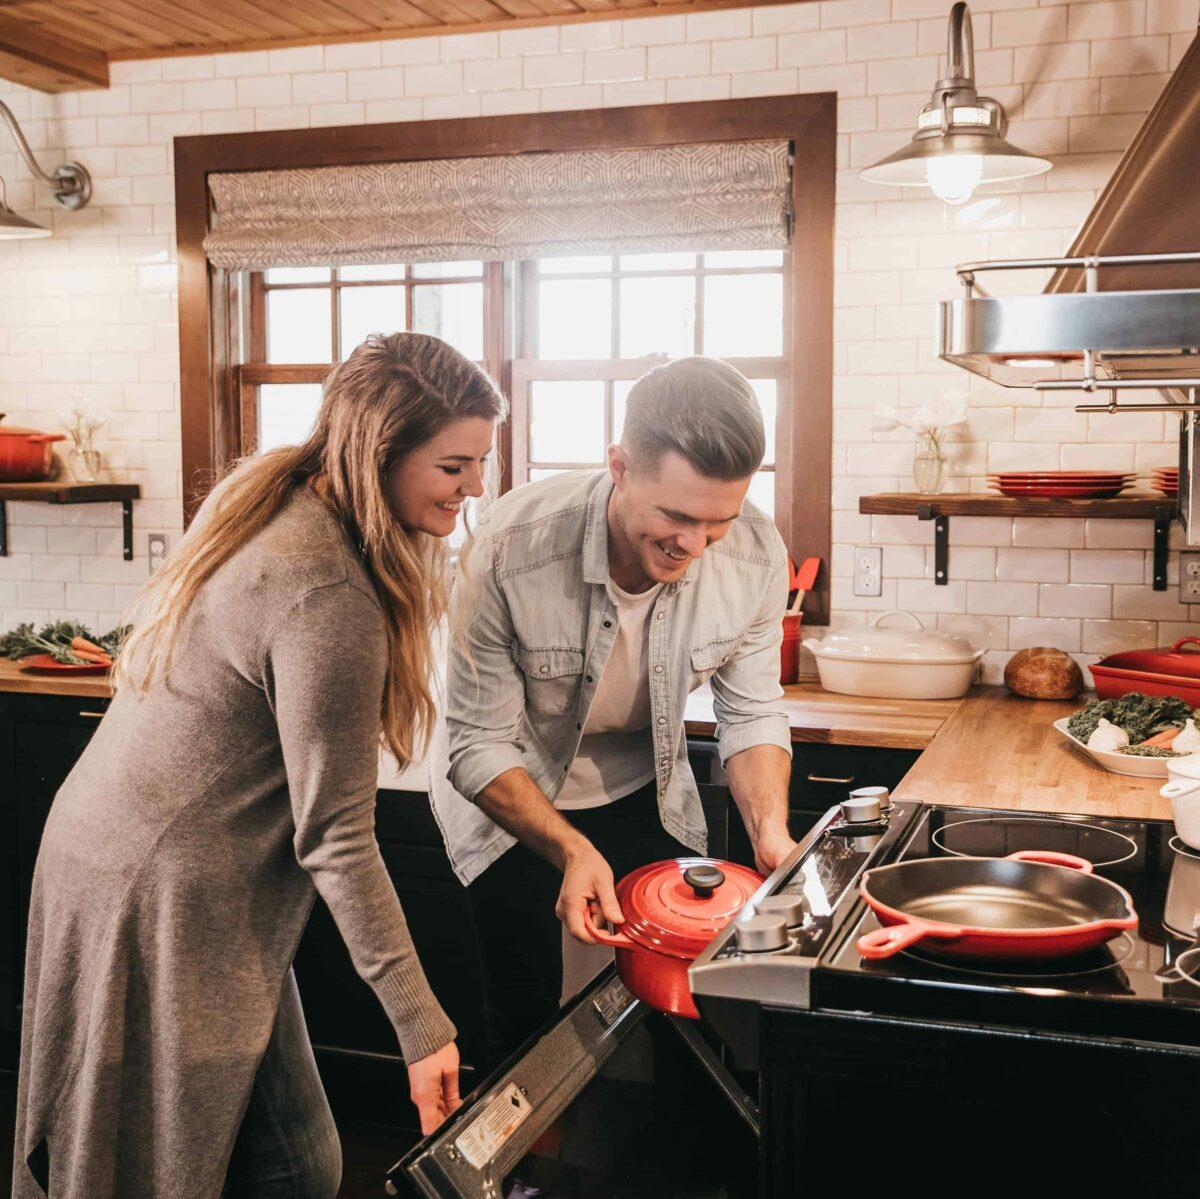 deep cleaning kitchen appliances